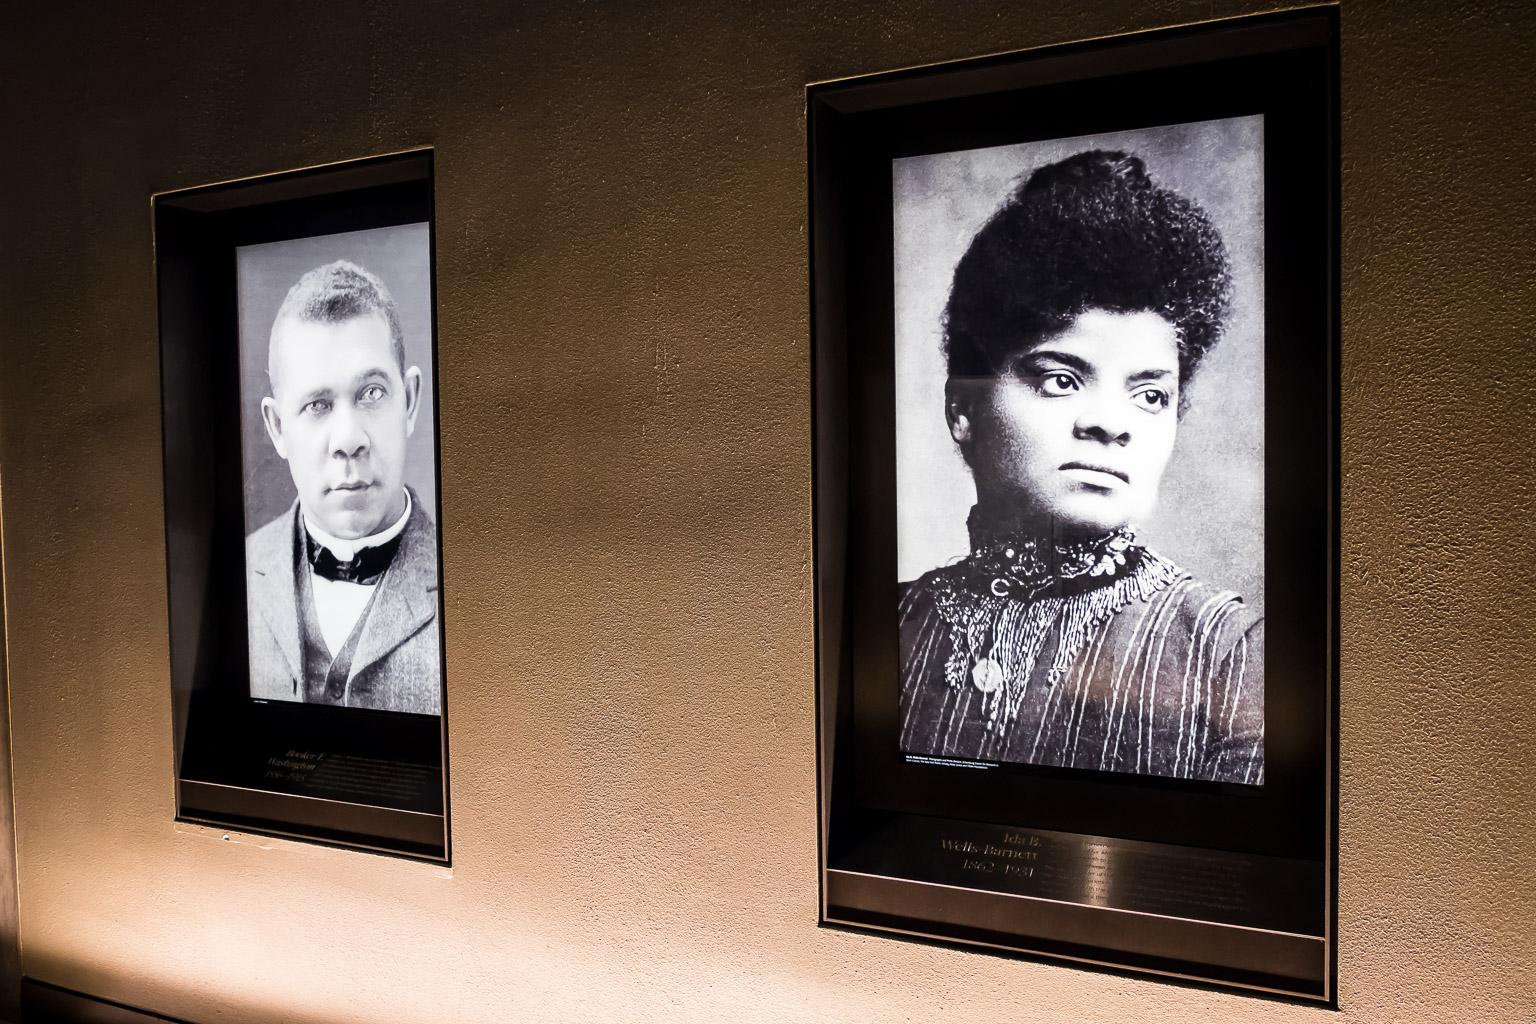 Left to right: Booker T. Washington, Ida B. Wells.